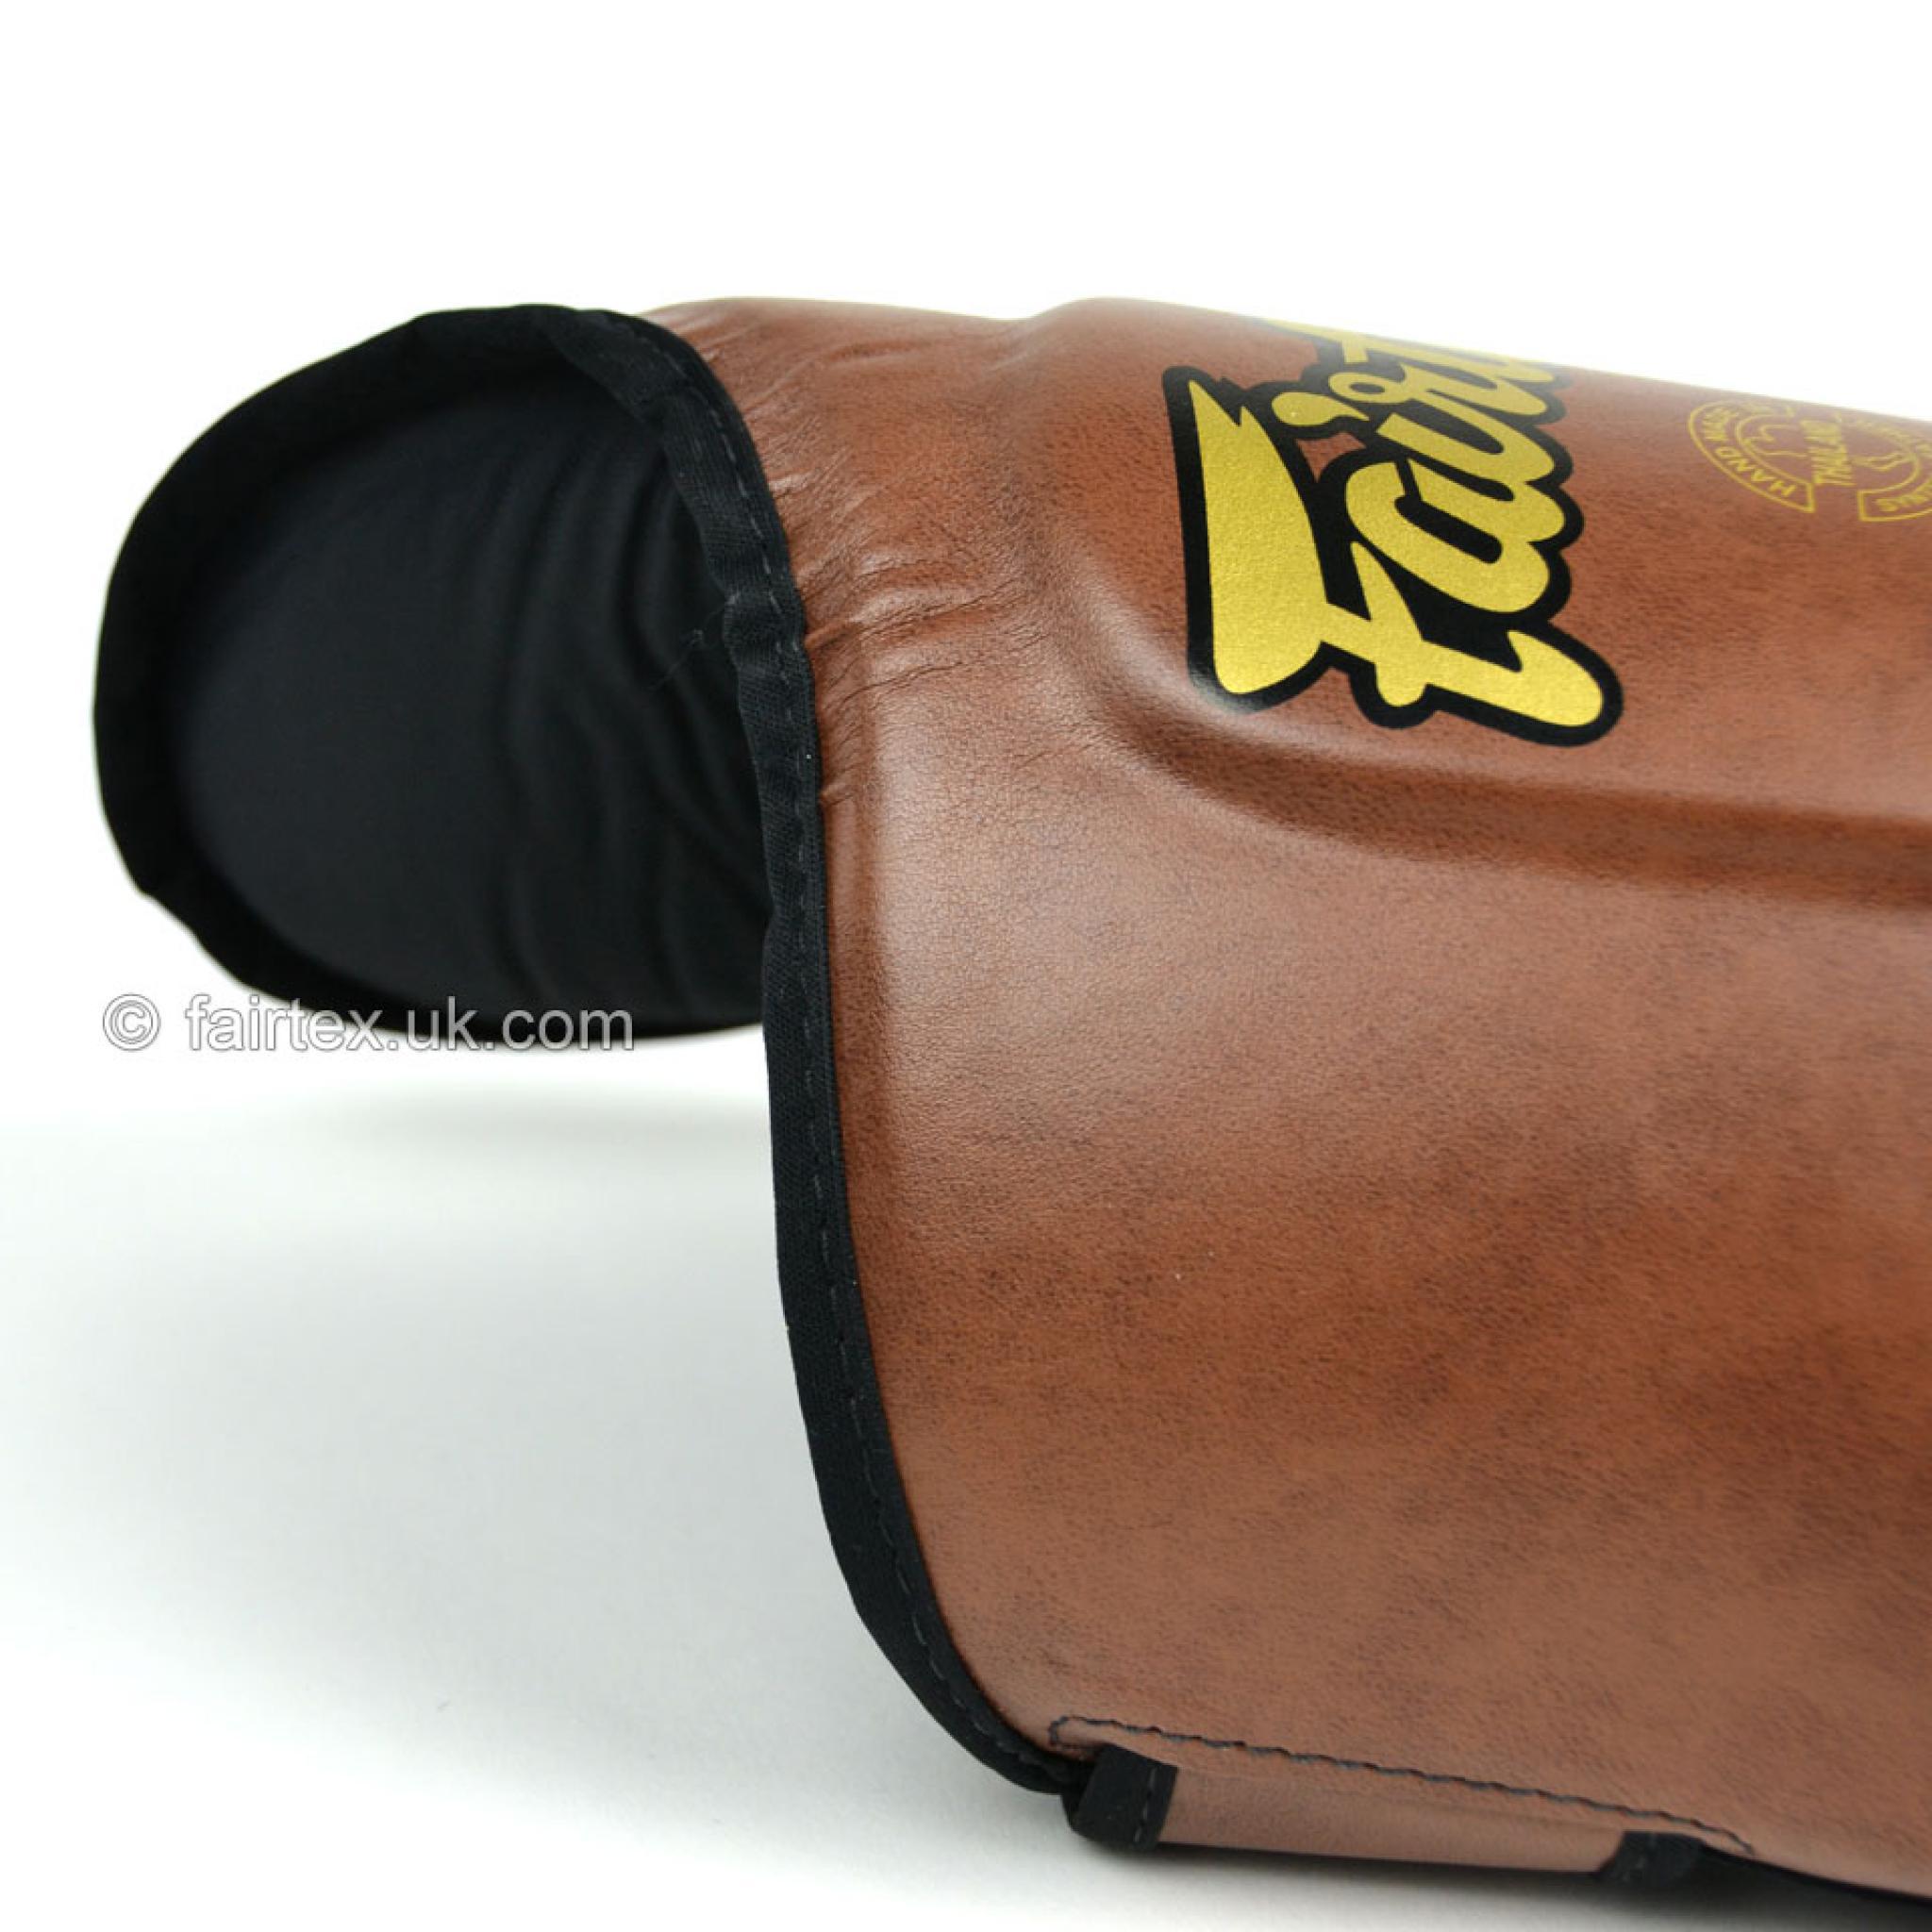 Pads Fairtex SP8 Vintage Brown Ultimate Muay Thai Boxing Shin Guards